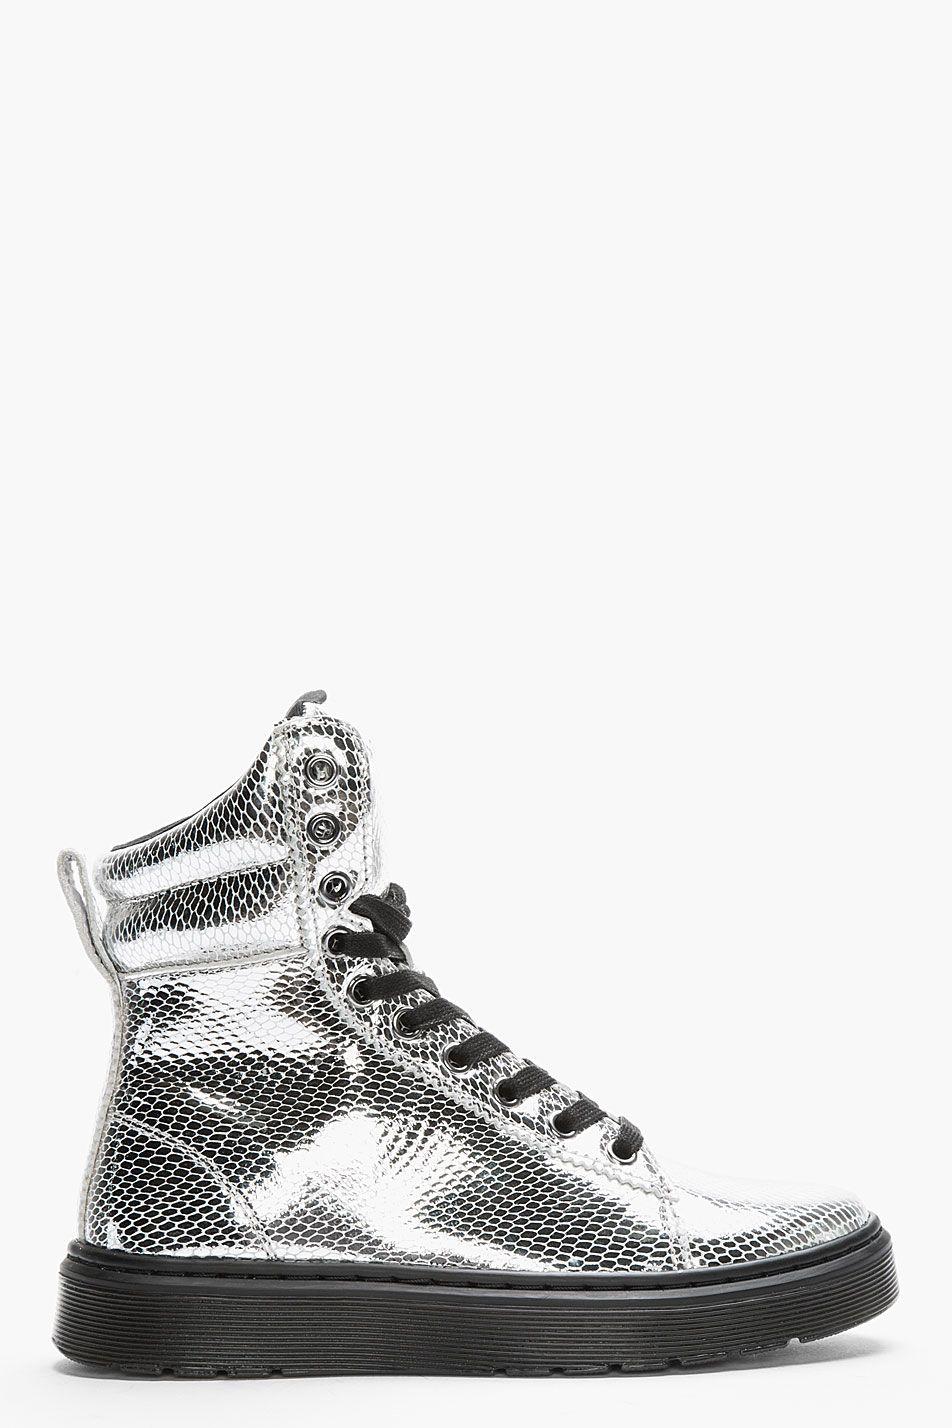 doc martens sneaker boots